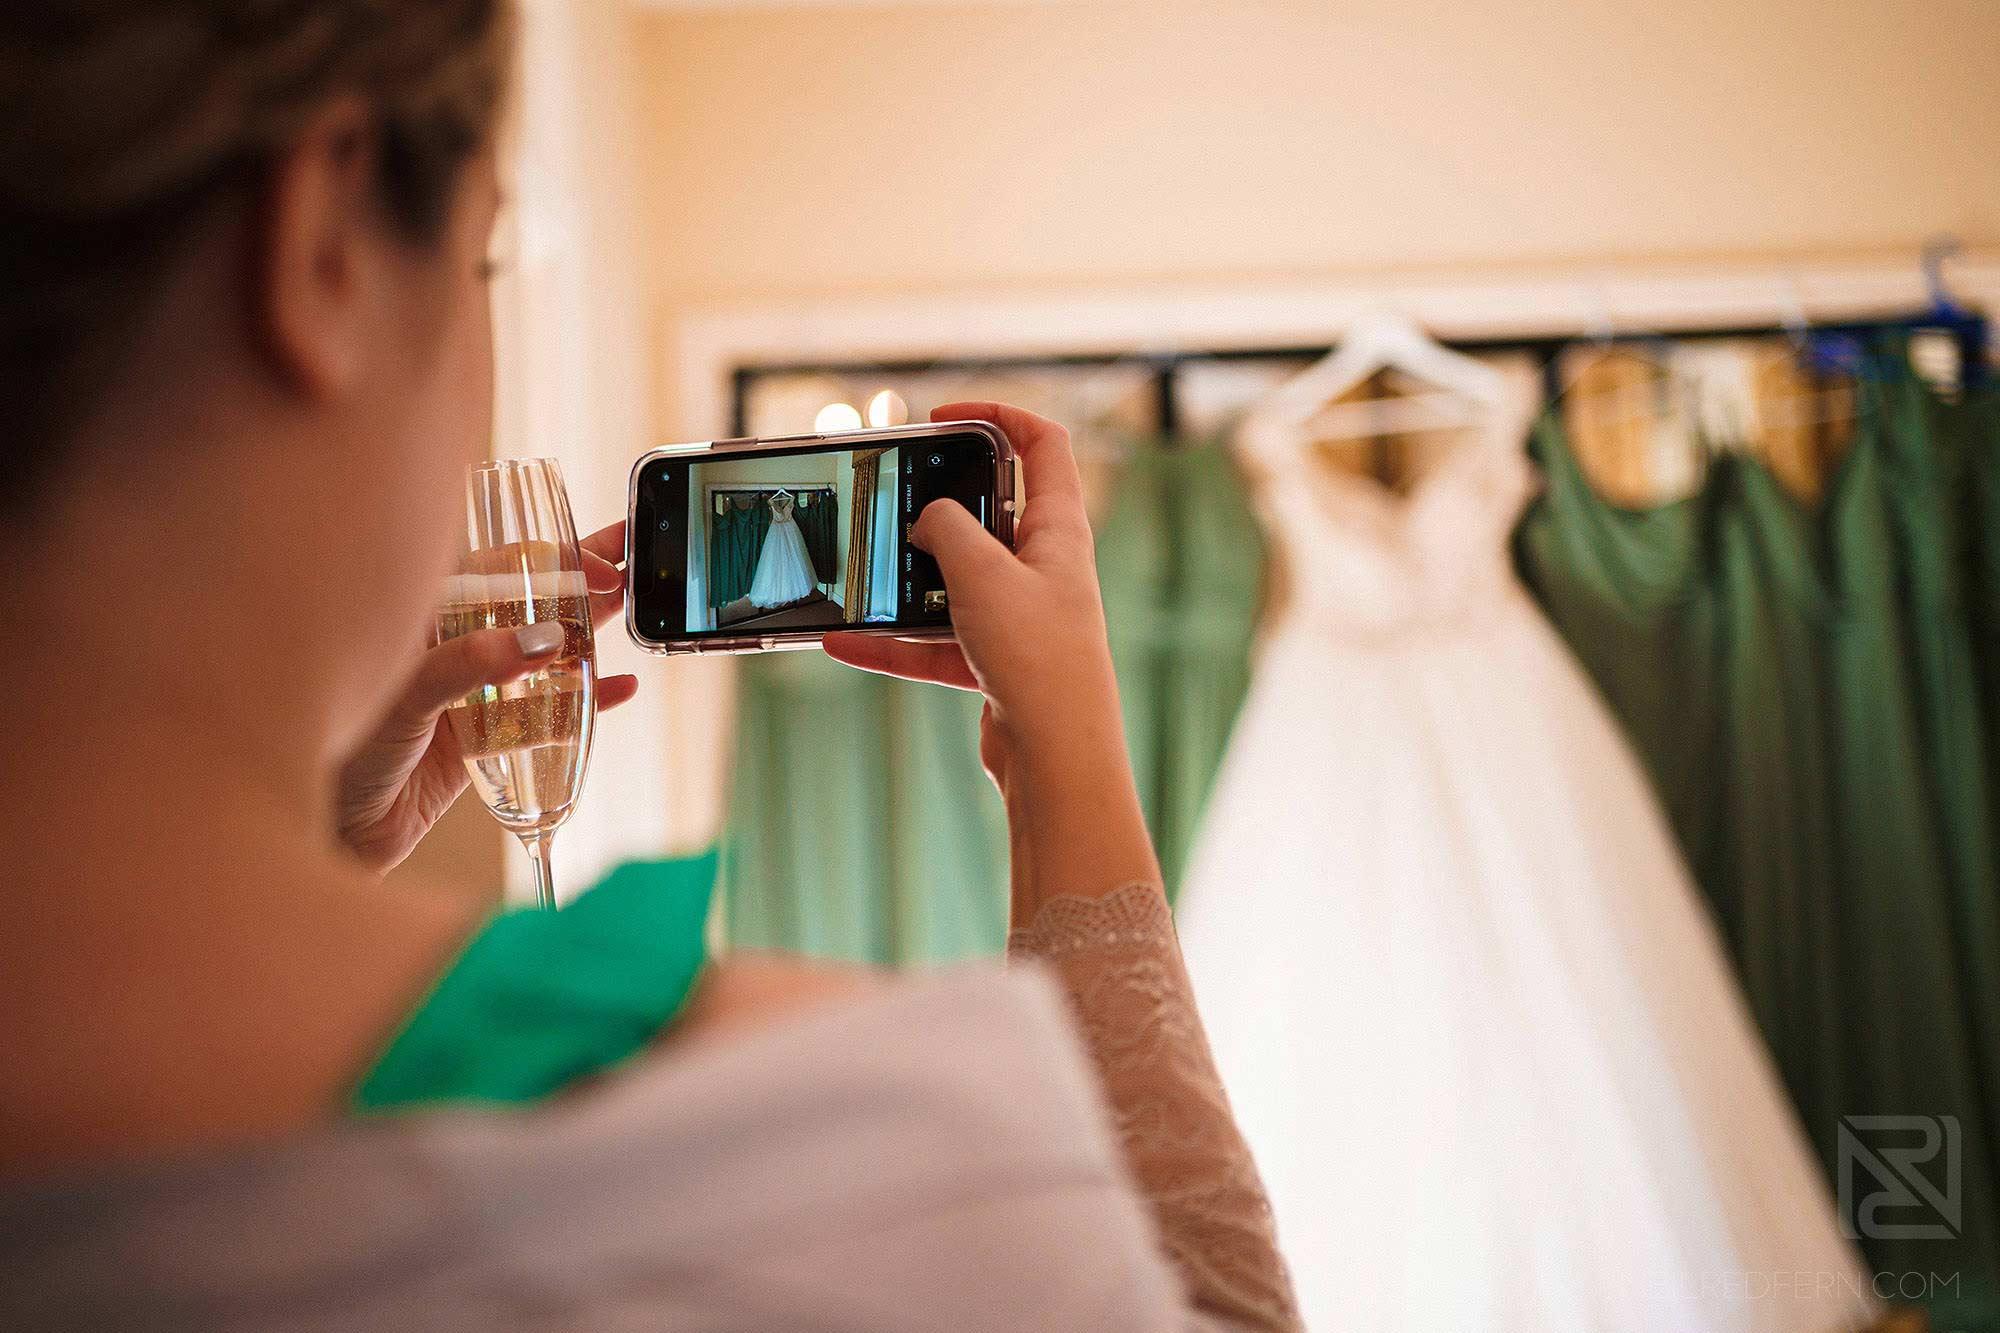 bridesmaid taking photograph of wedding dress